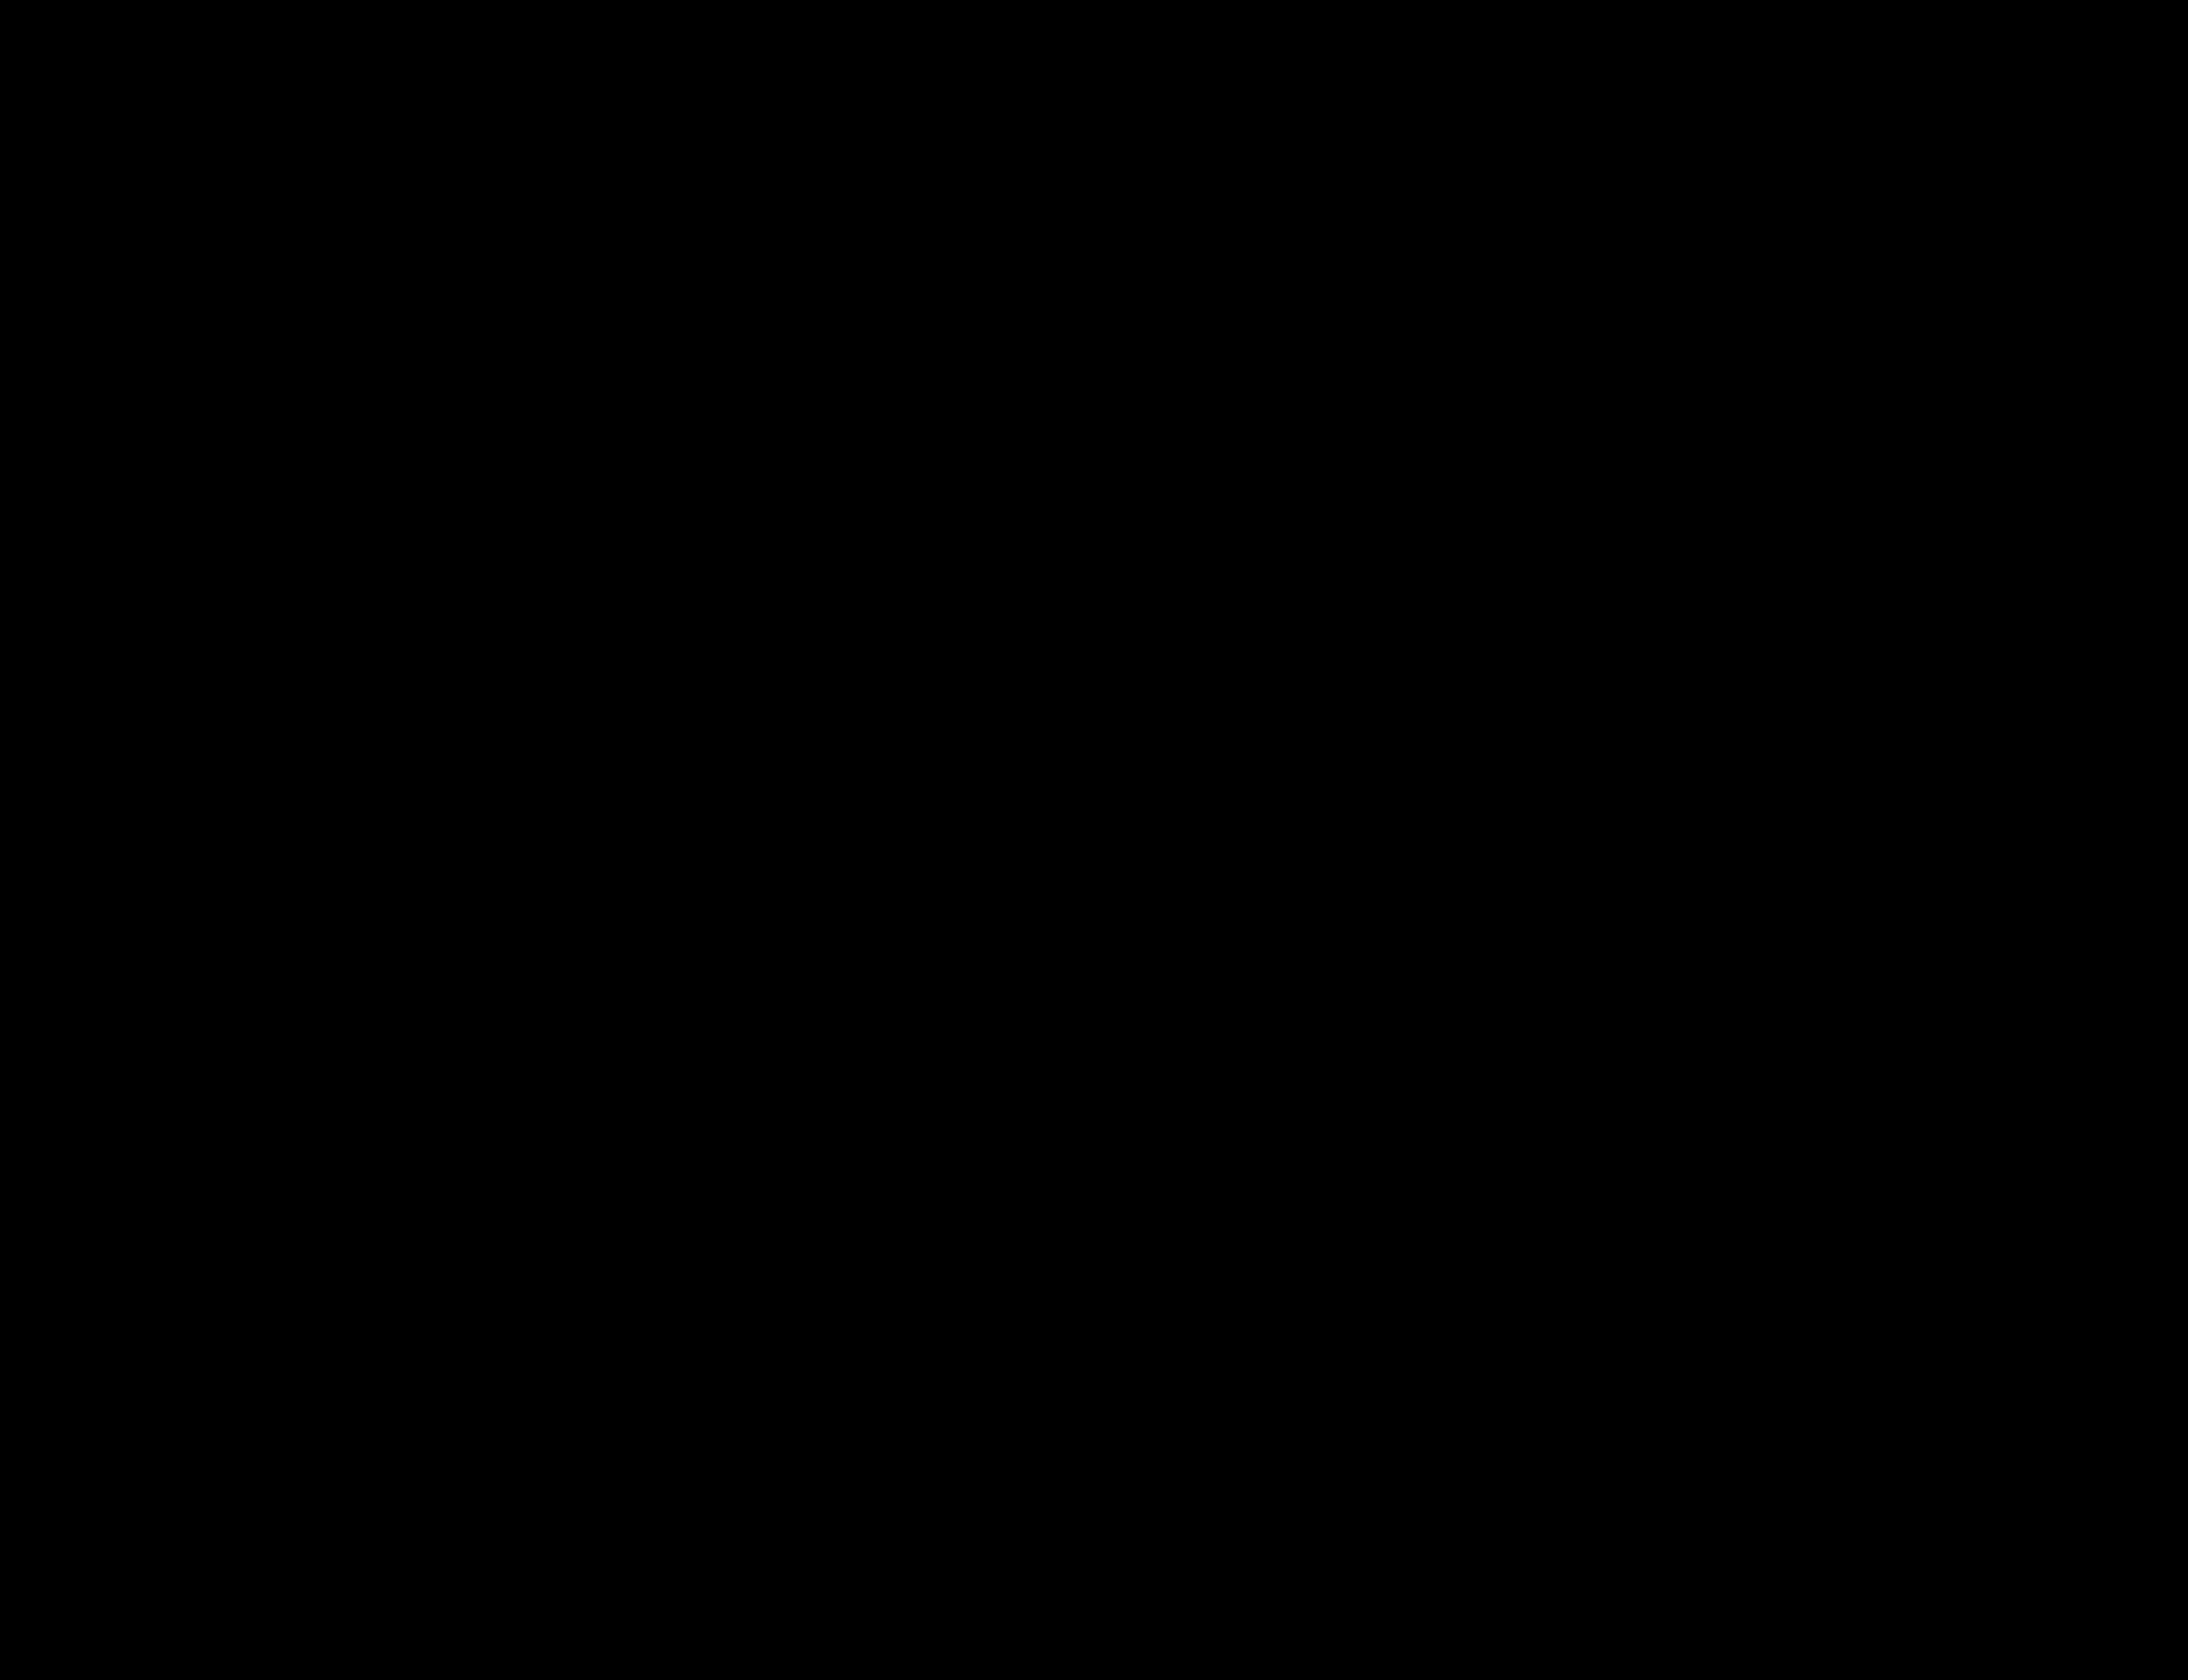 2310x1774 Clipart